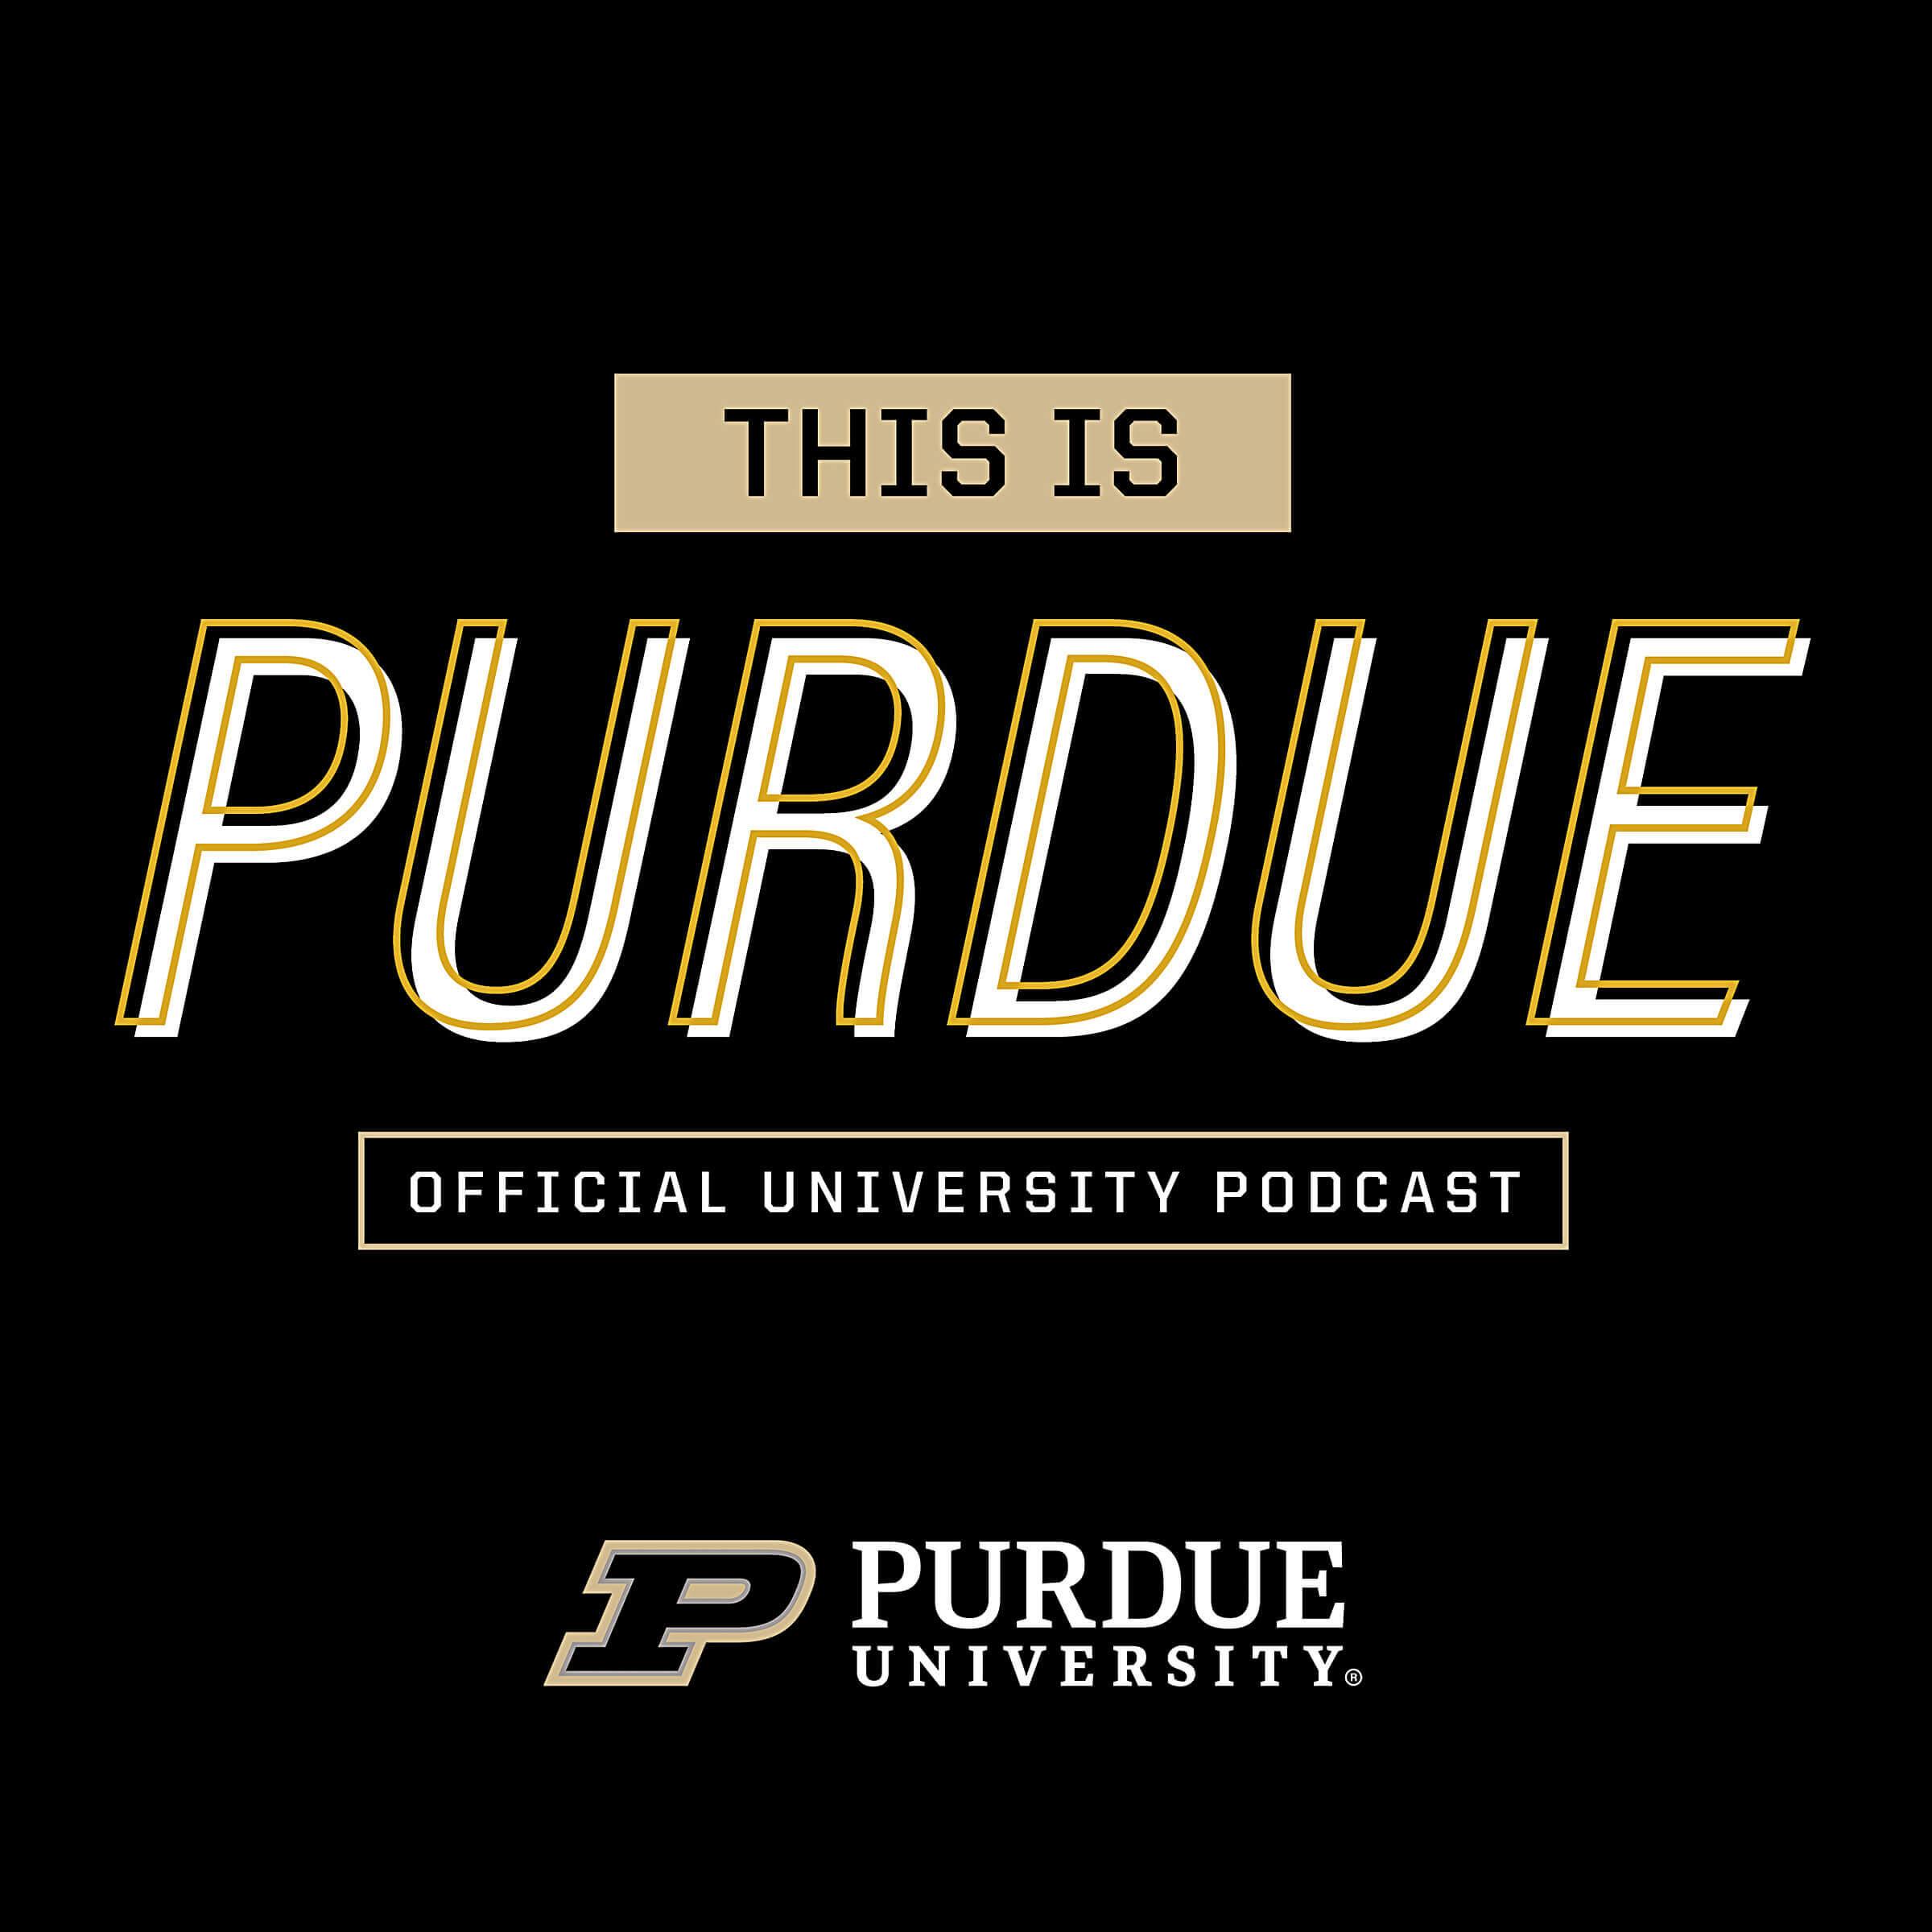 purdue-podcast